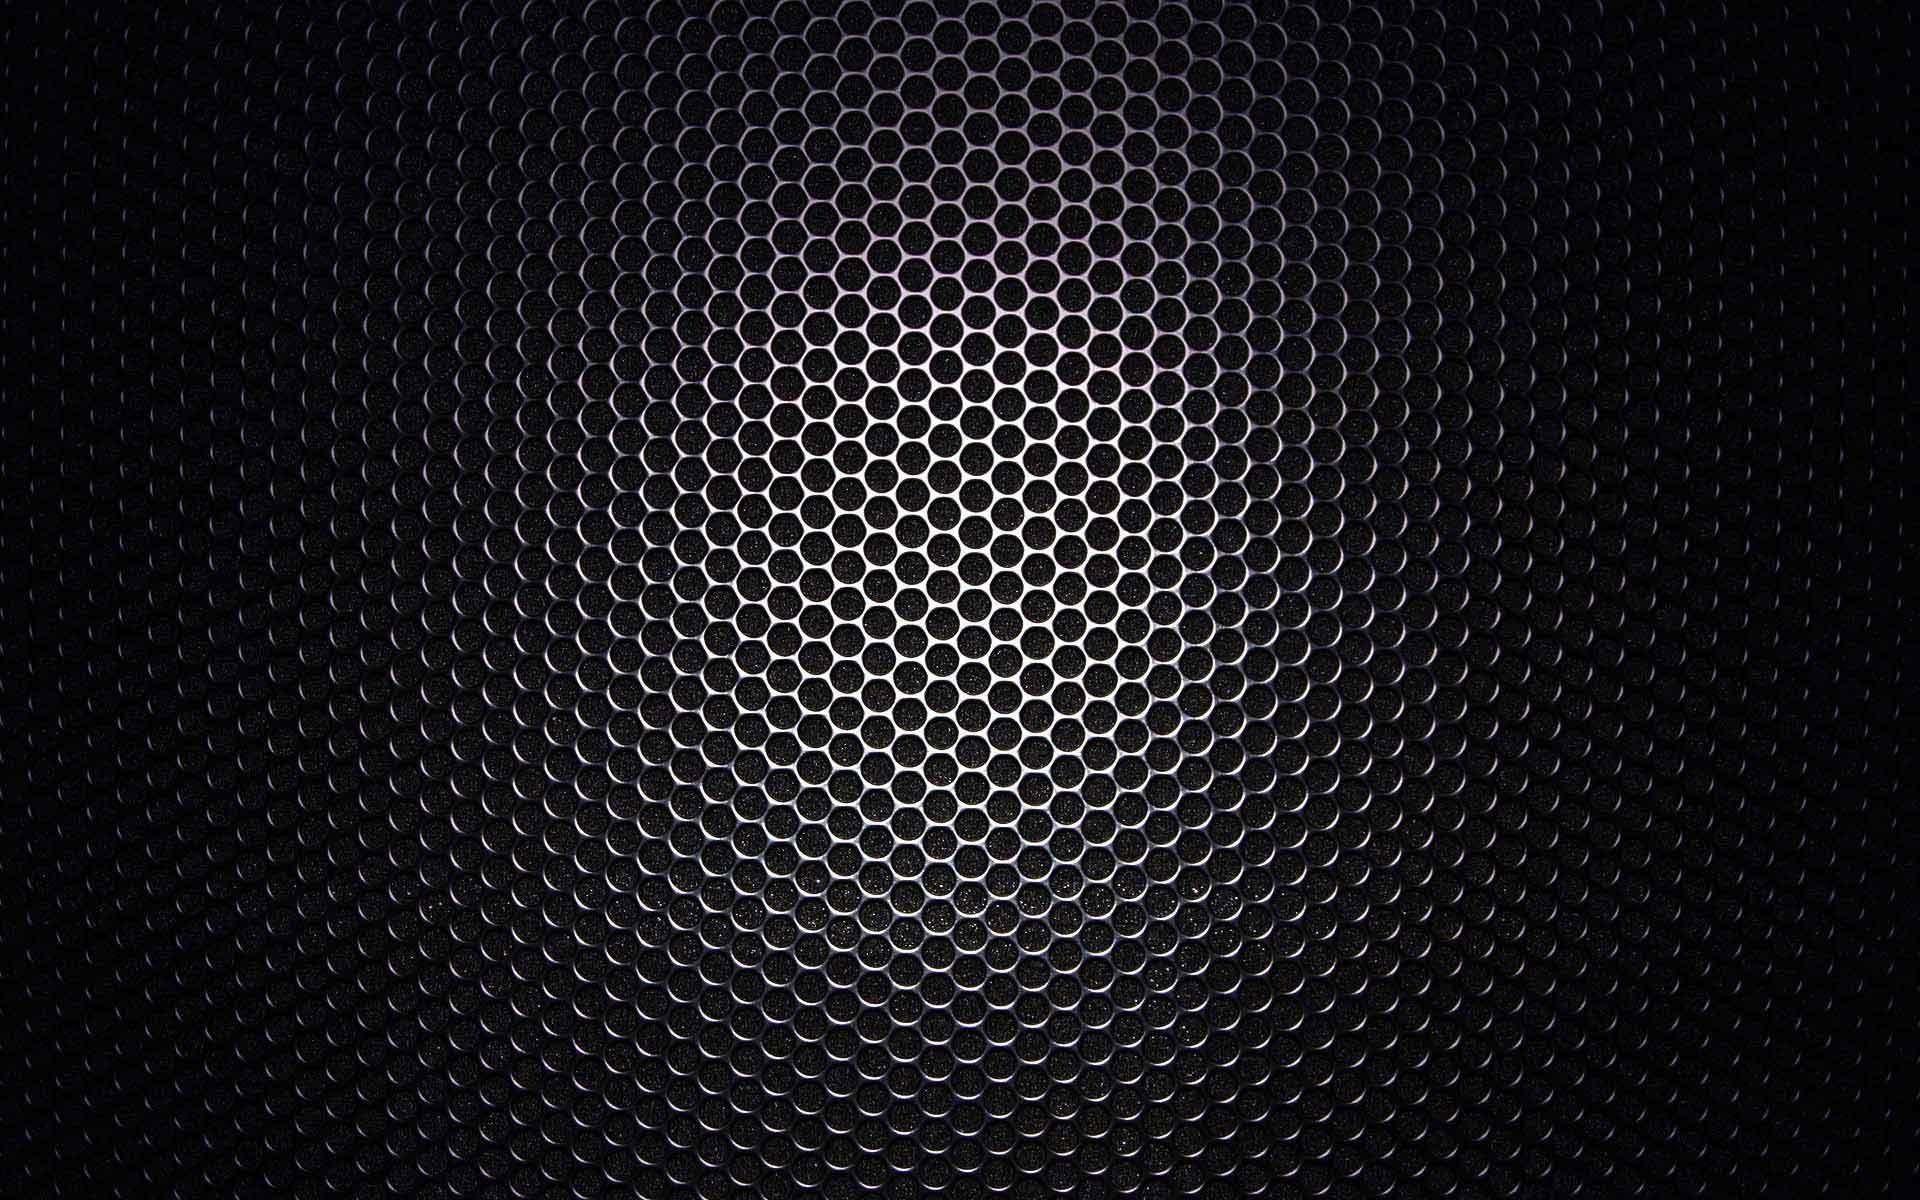 1920x1080 Download desktop dark Minimal wallpapers HD. Plain Black .